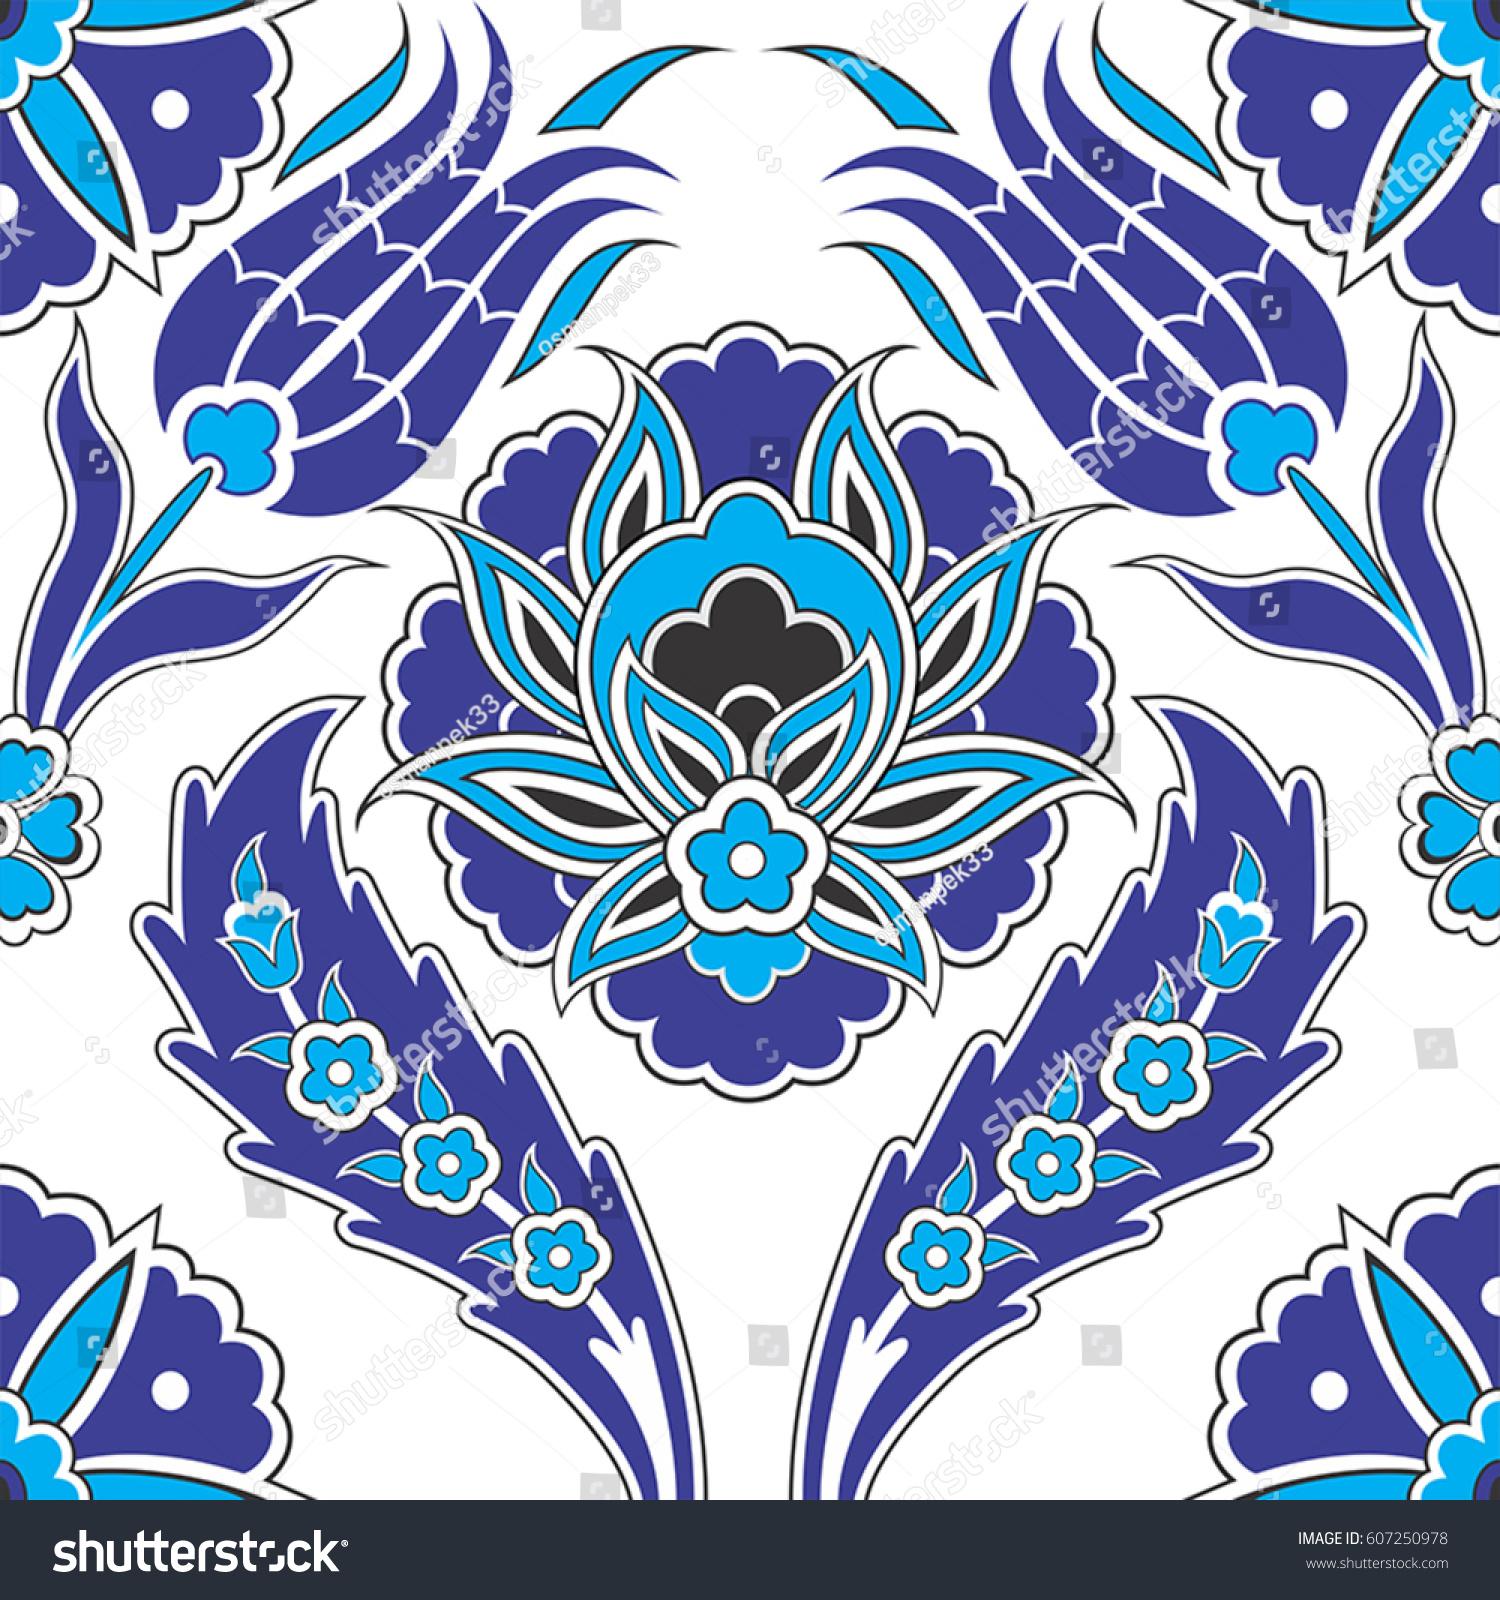 Mosaic Tile Patternislamic Motif Stock Vector 607250978 - Shutterstock